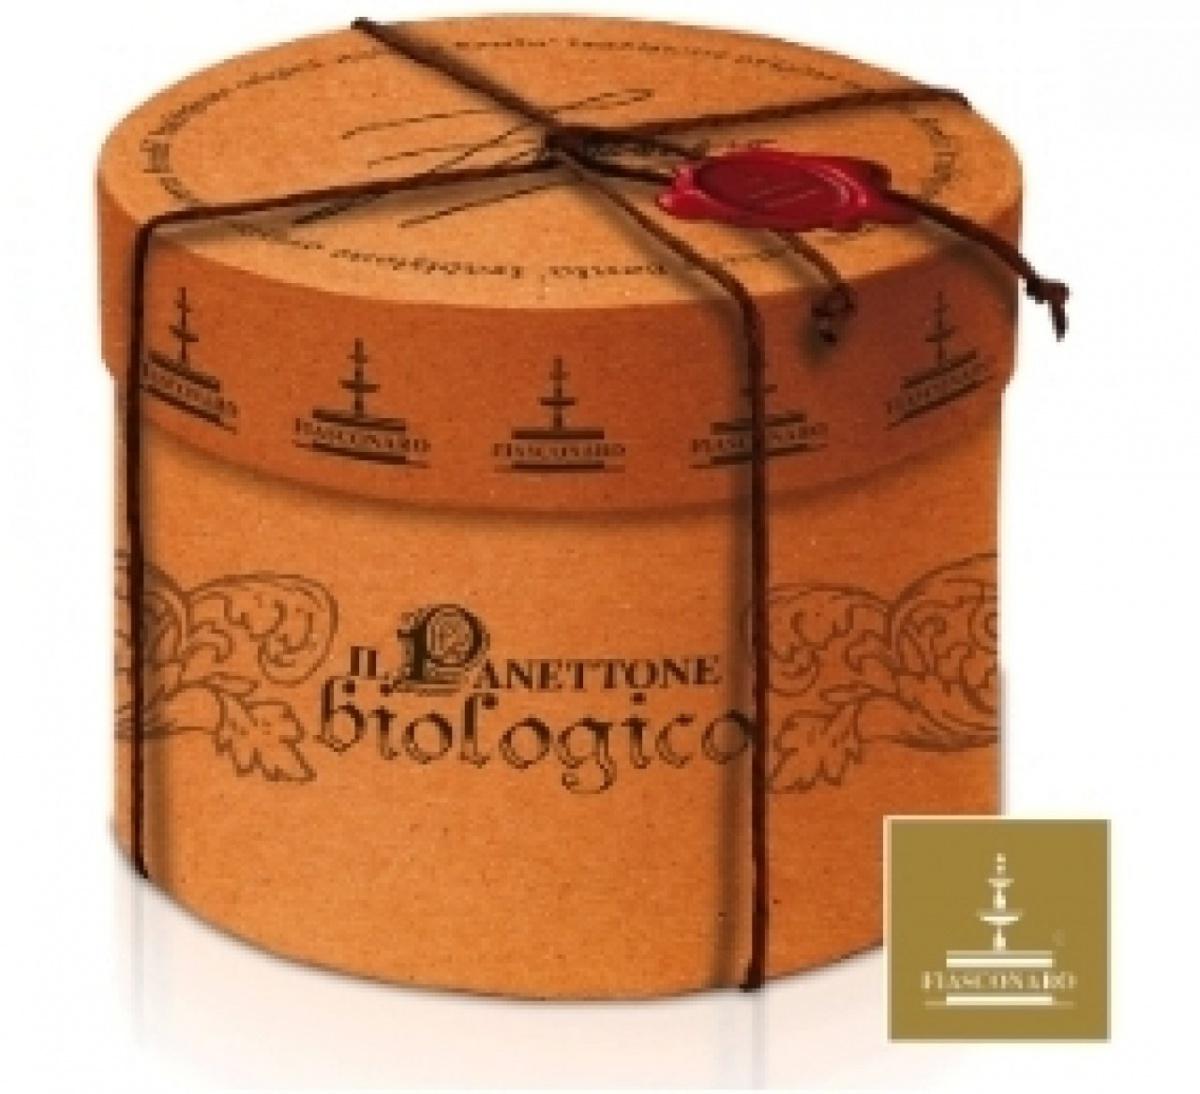 The 'Hatbox' Panettone